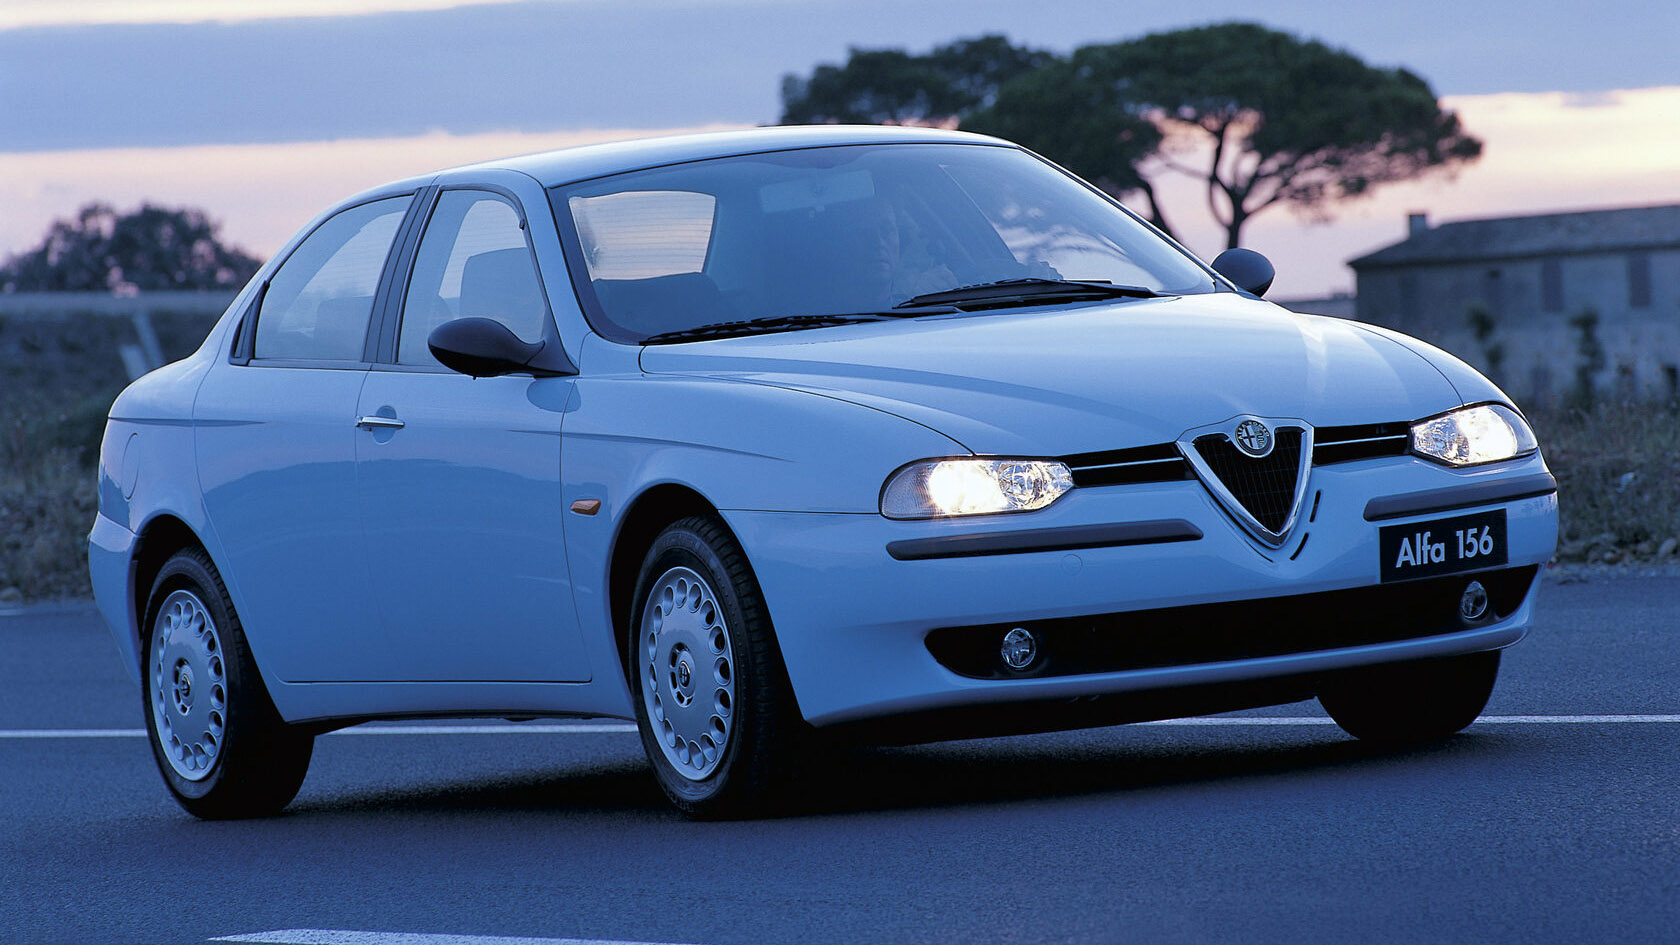 '90s klassiekers: Alfa Romeo 156